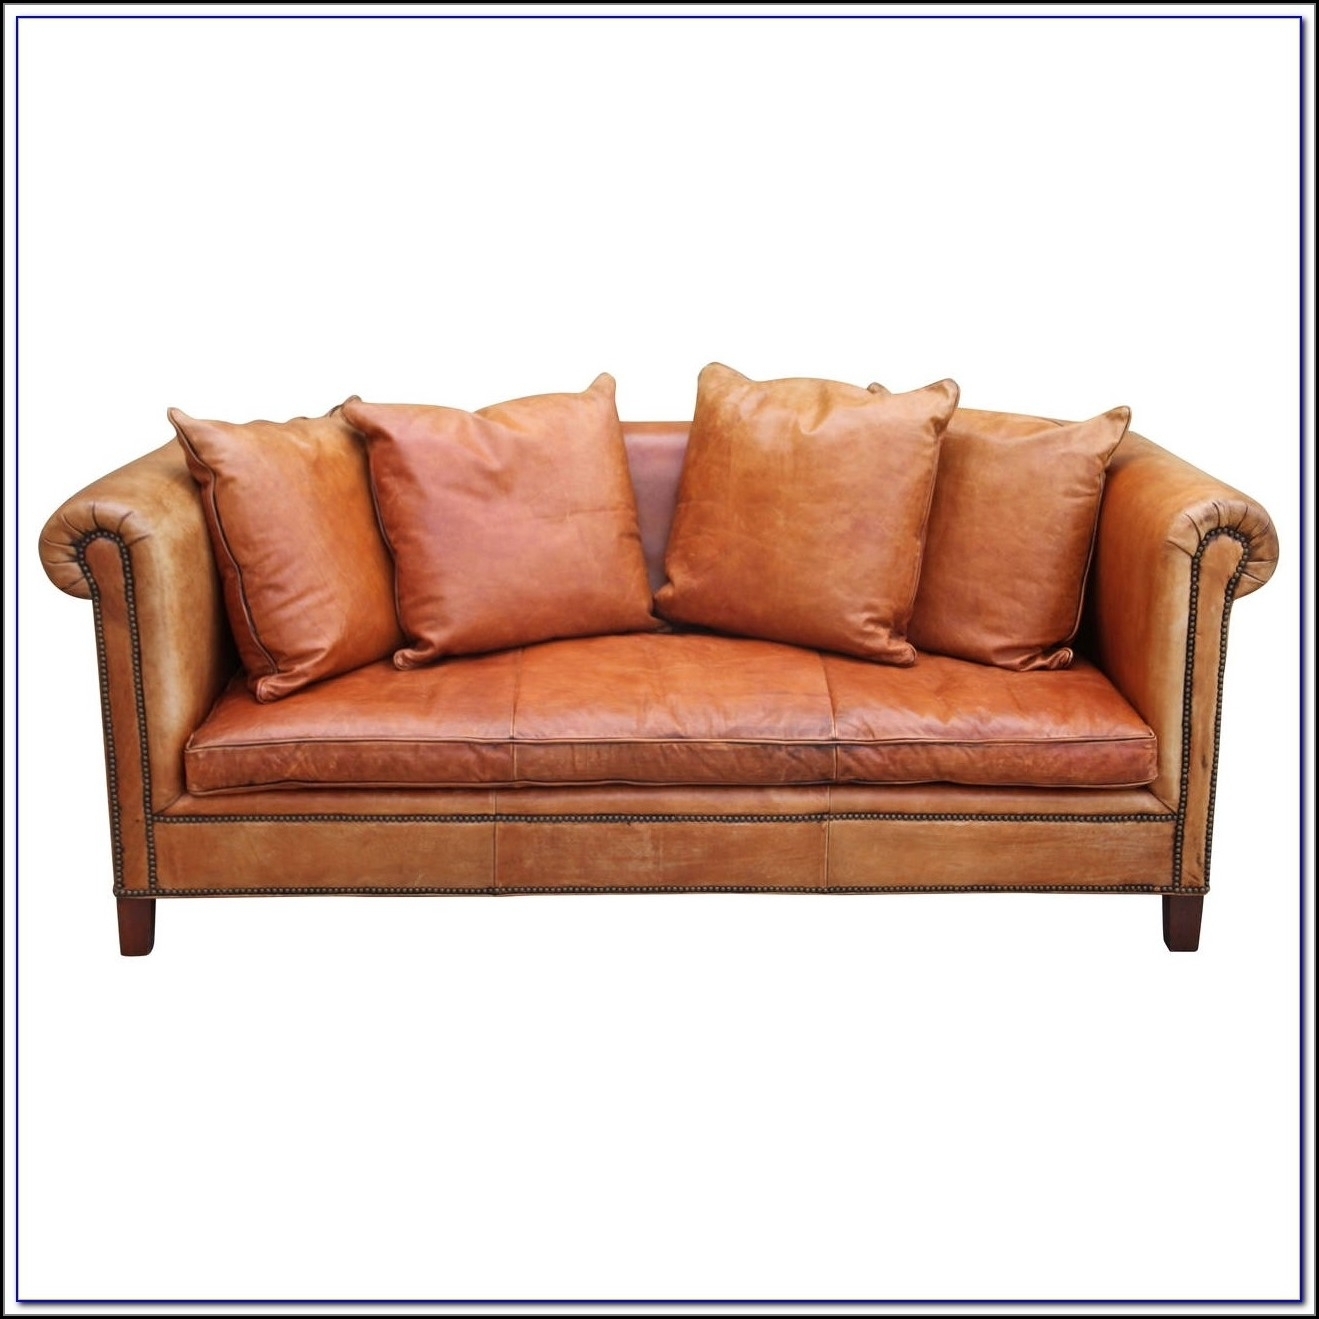 Ralph Lauren Leather Sofa Craigslist – Sofa : Home Furniture Ideas Within Craigslist Leather Sofas (Image 7 of 10)